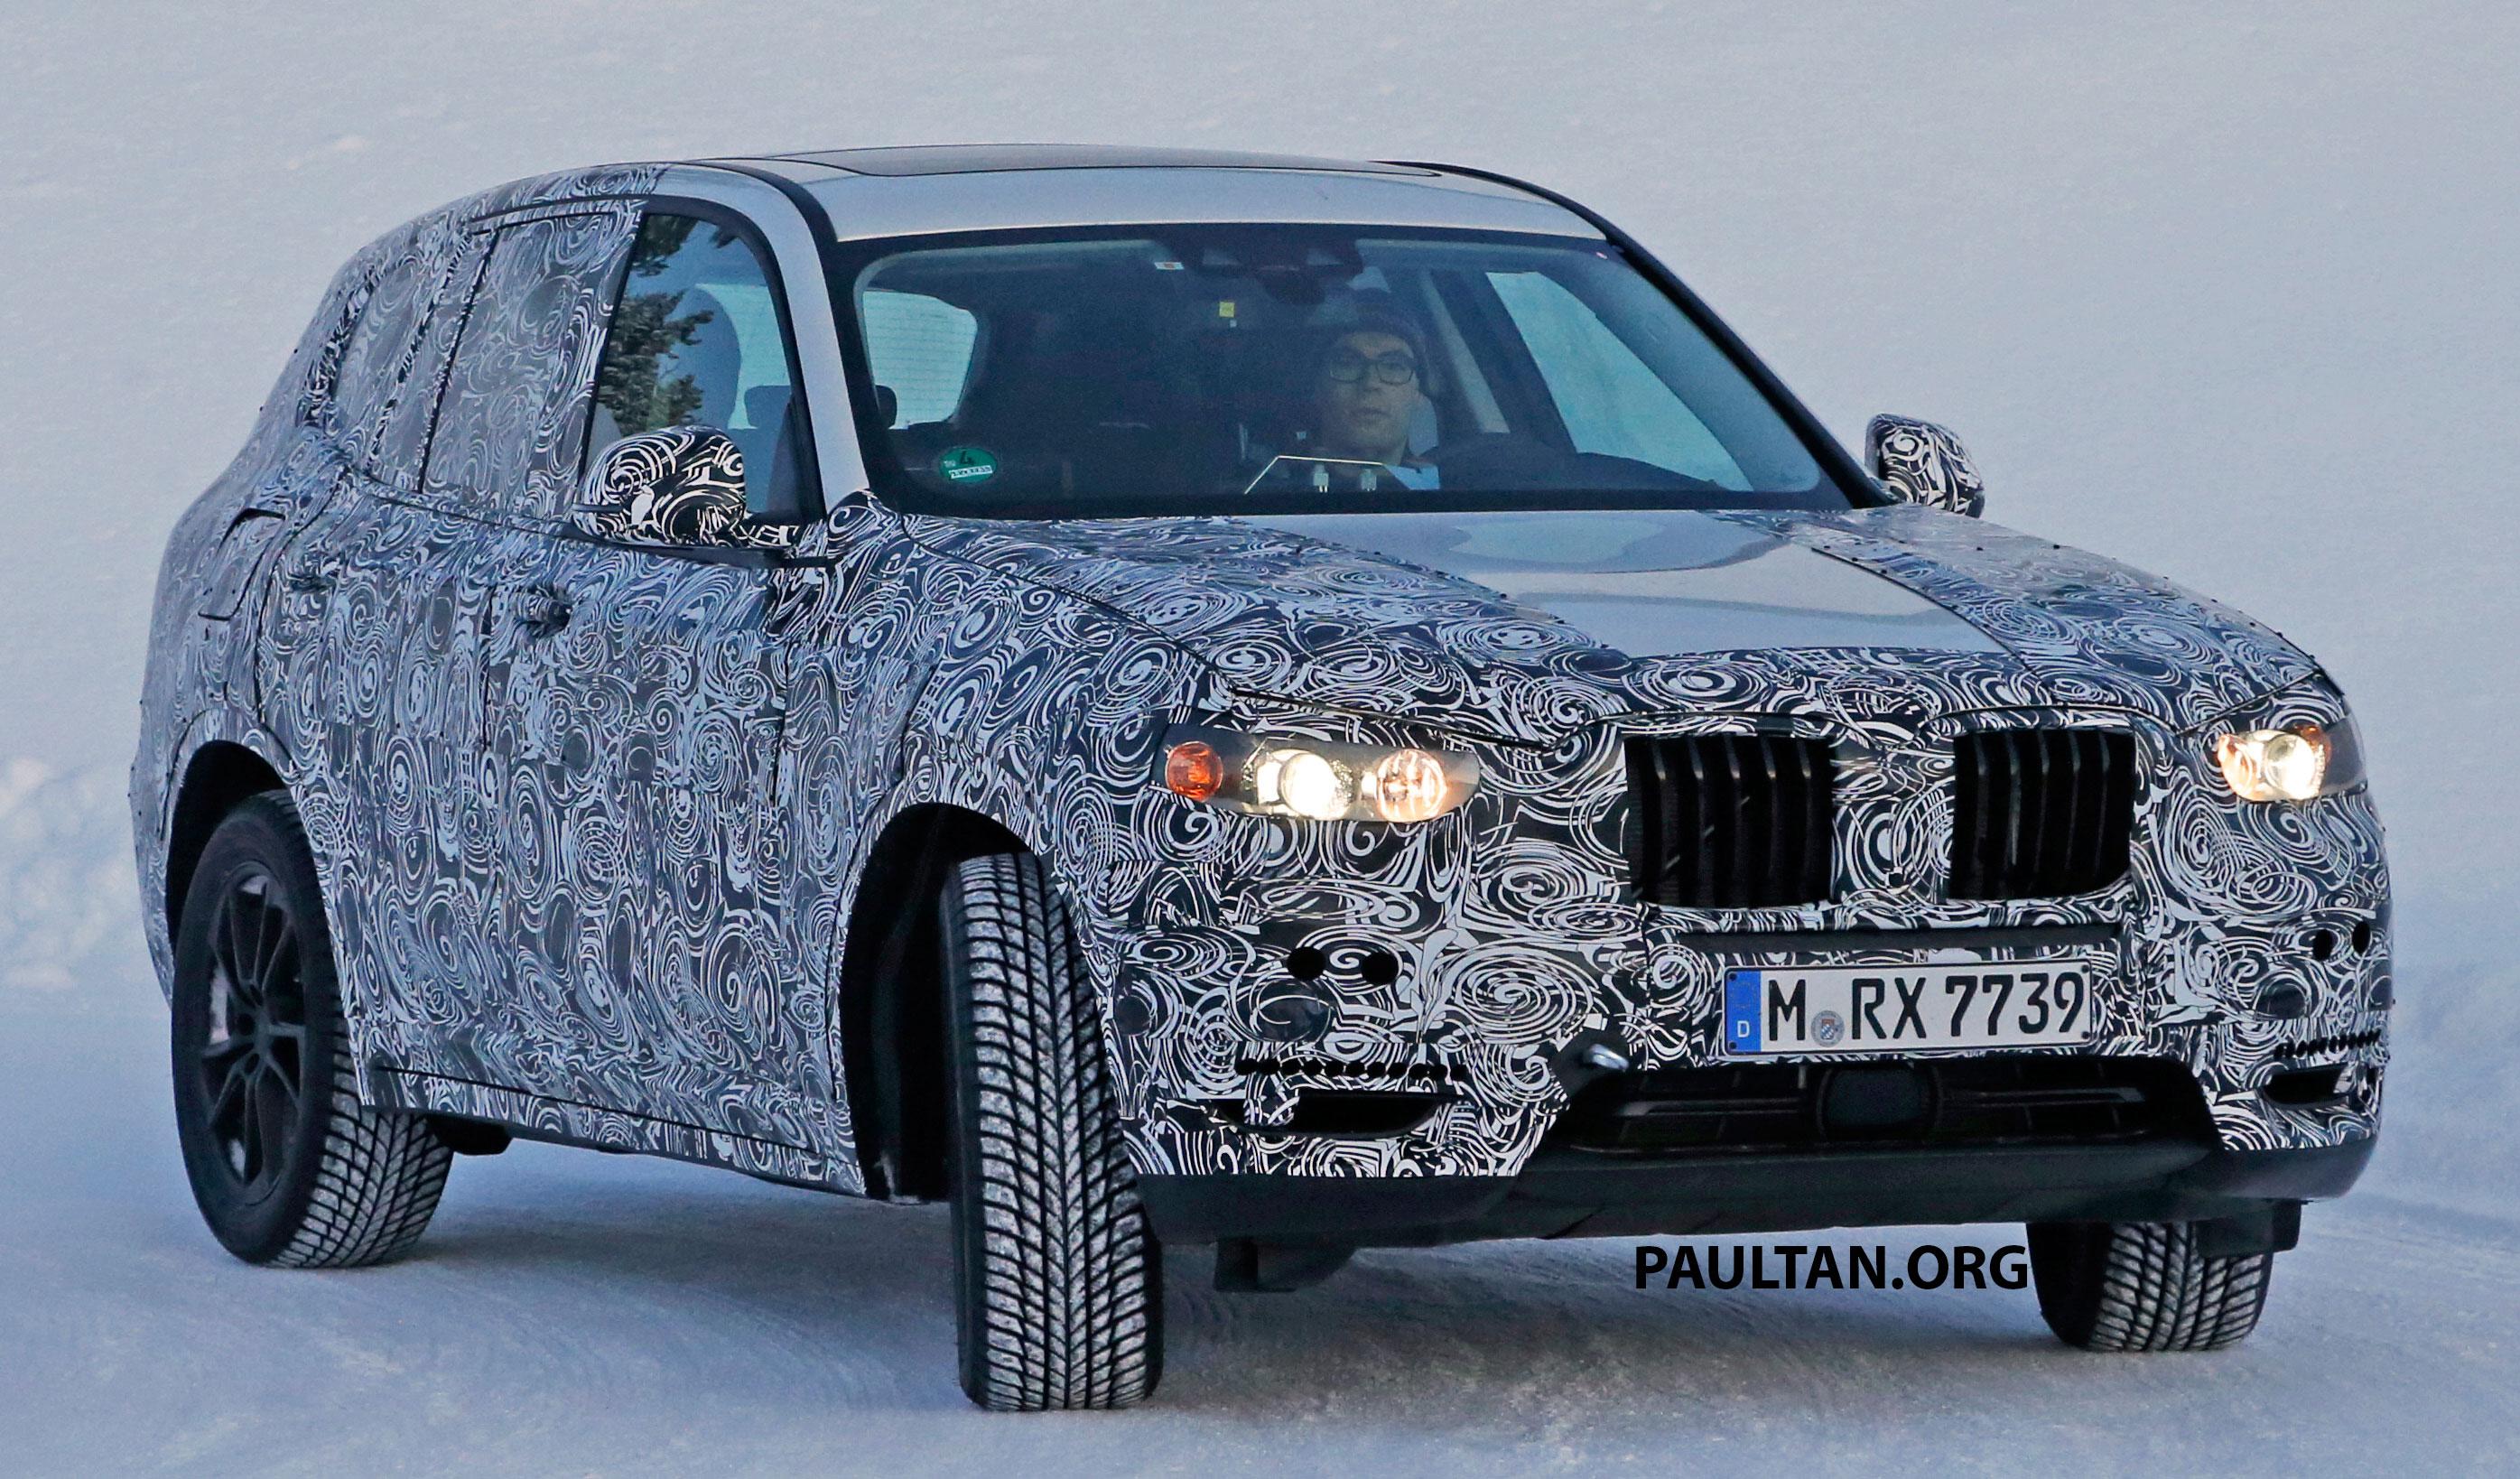 Bmw X3 G01 >> SPYSHOTS: G01 BMW X3 threading through the snow Paul Tan - Image 423449